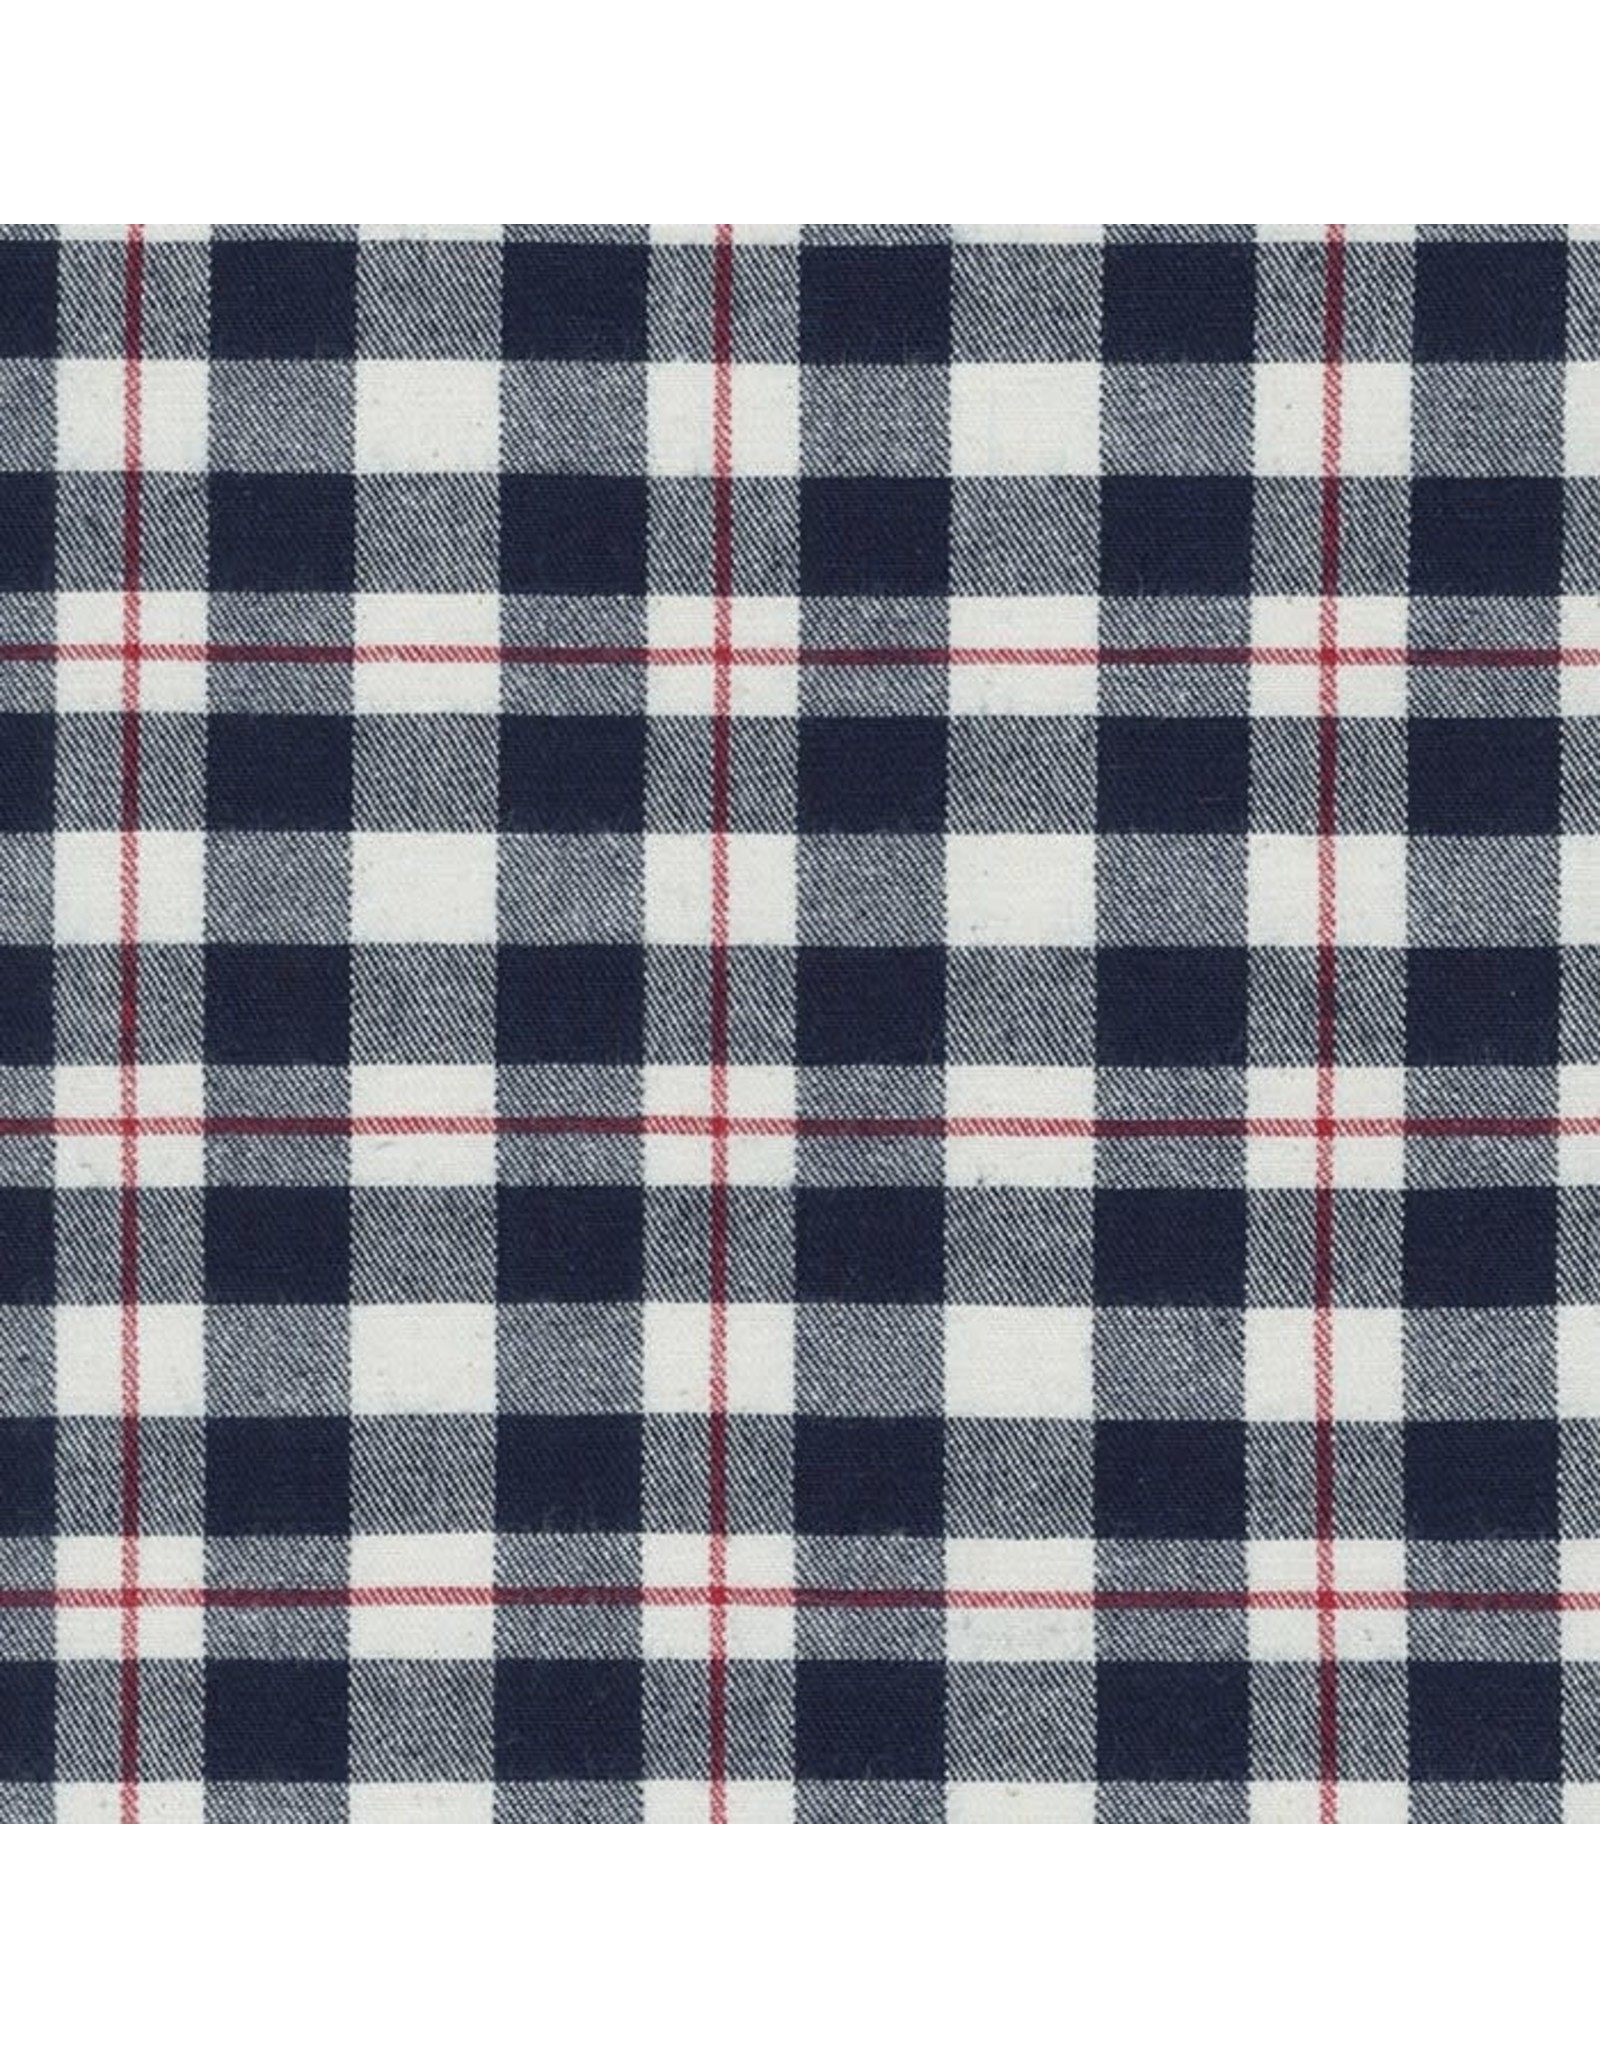 Robert Kaufman Denim Junction Yarn Dyed Washed in Indigo, Fabric Half-Yards